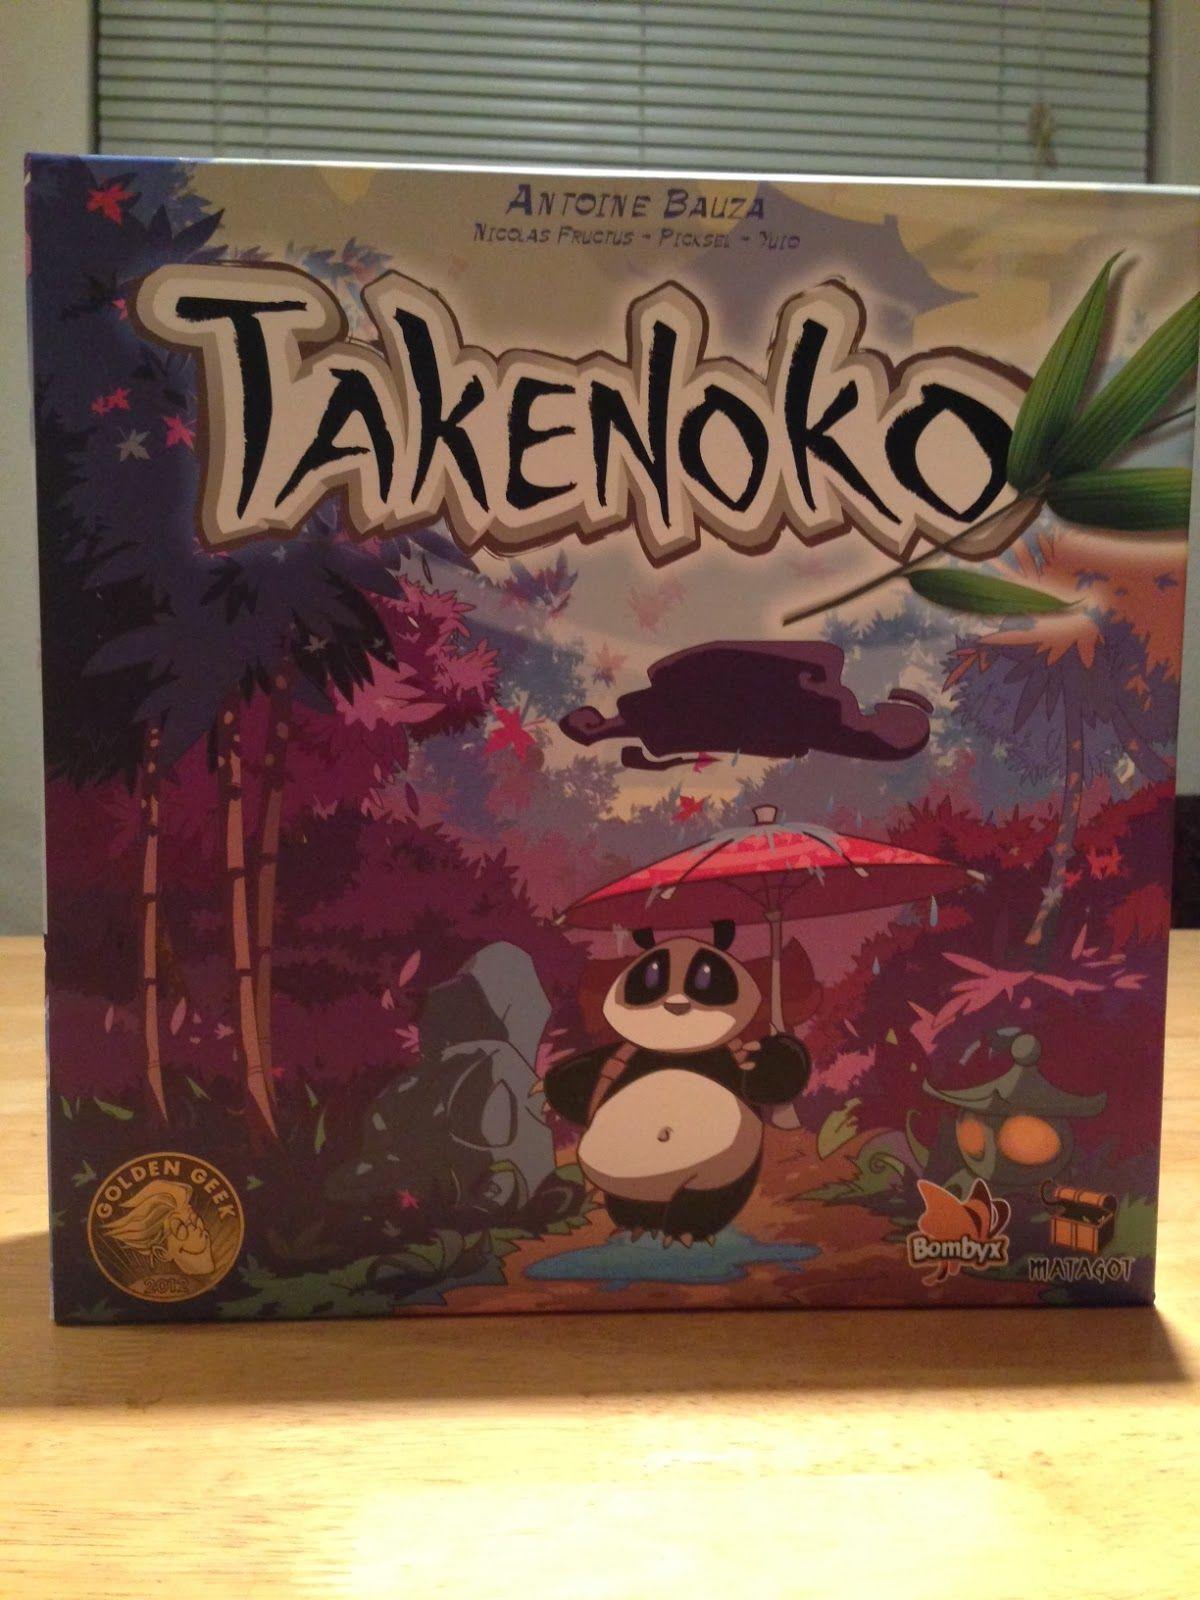 Homemaker Hobbies Takenoko Review takenoko boardgame